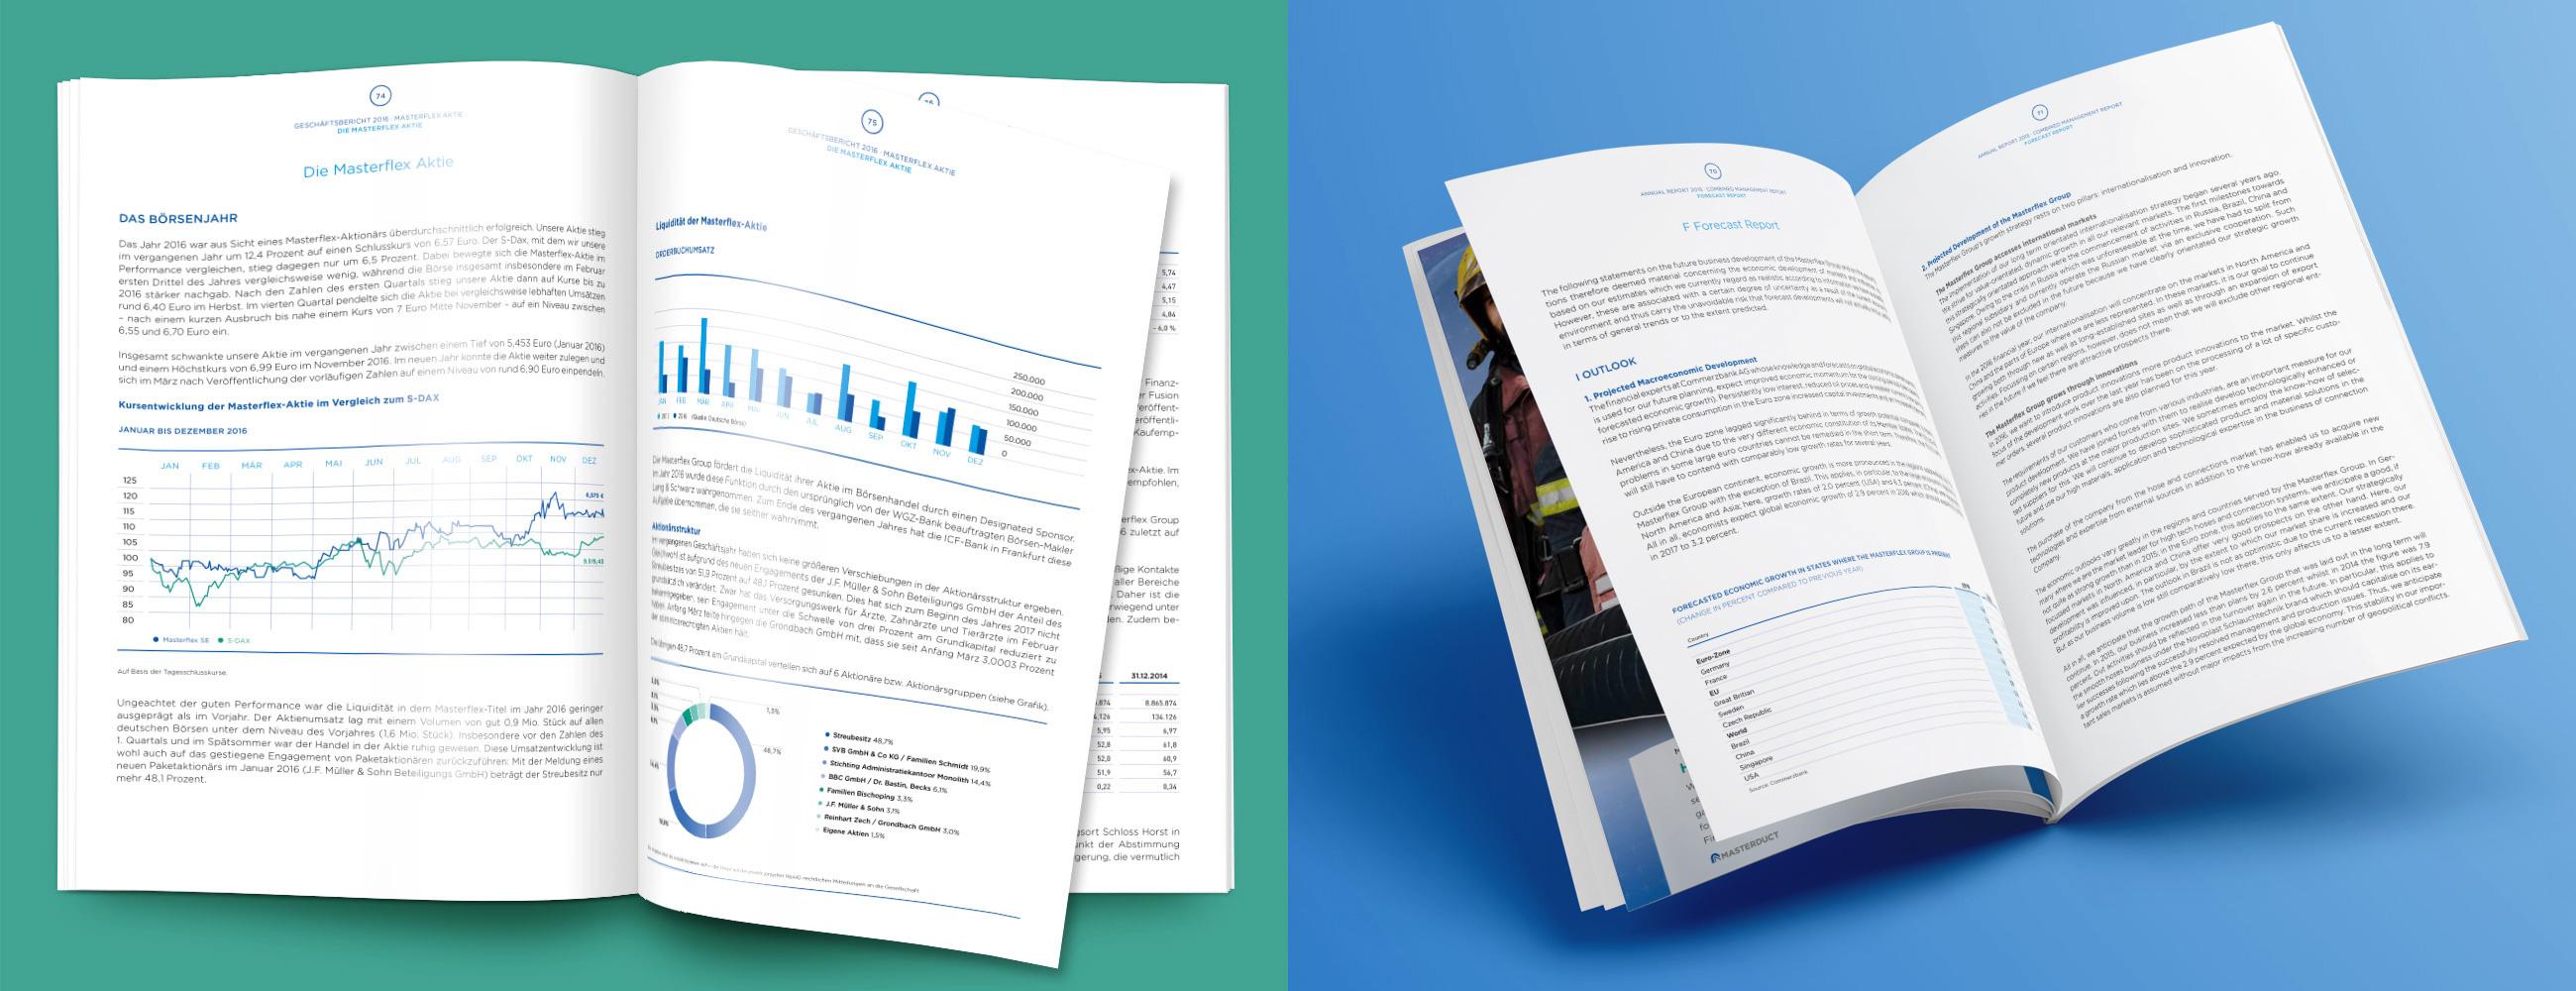 Masterflex Contigo Geschäftsbericht Konzept Strategie IR Investor Relations Annual Reporting Contigo